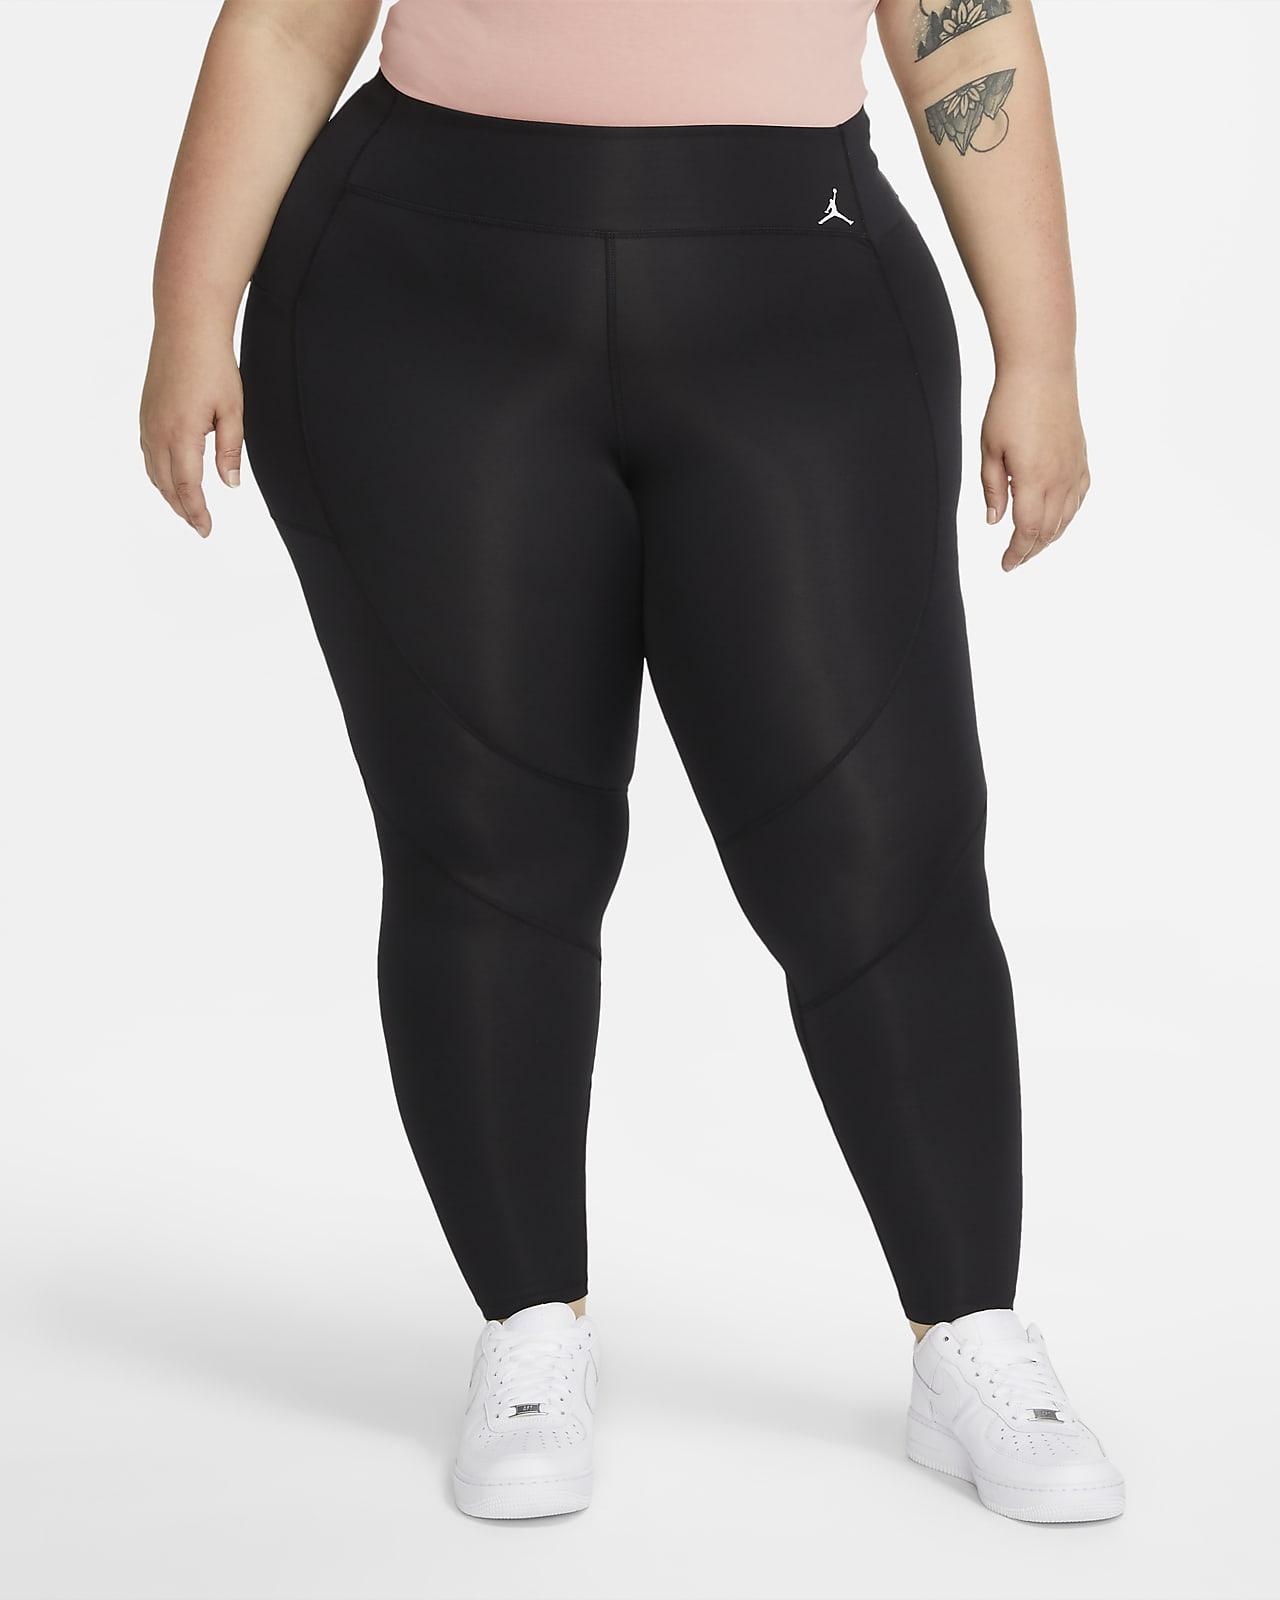 Bungalow Plano Insignia  Jordan Essential Women's 7/8 Tights (Plus Size). Nike.com